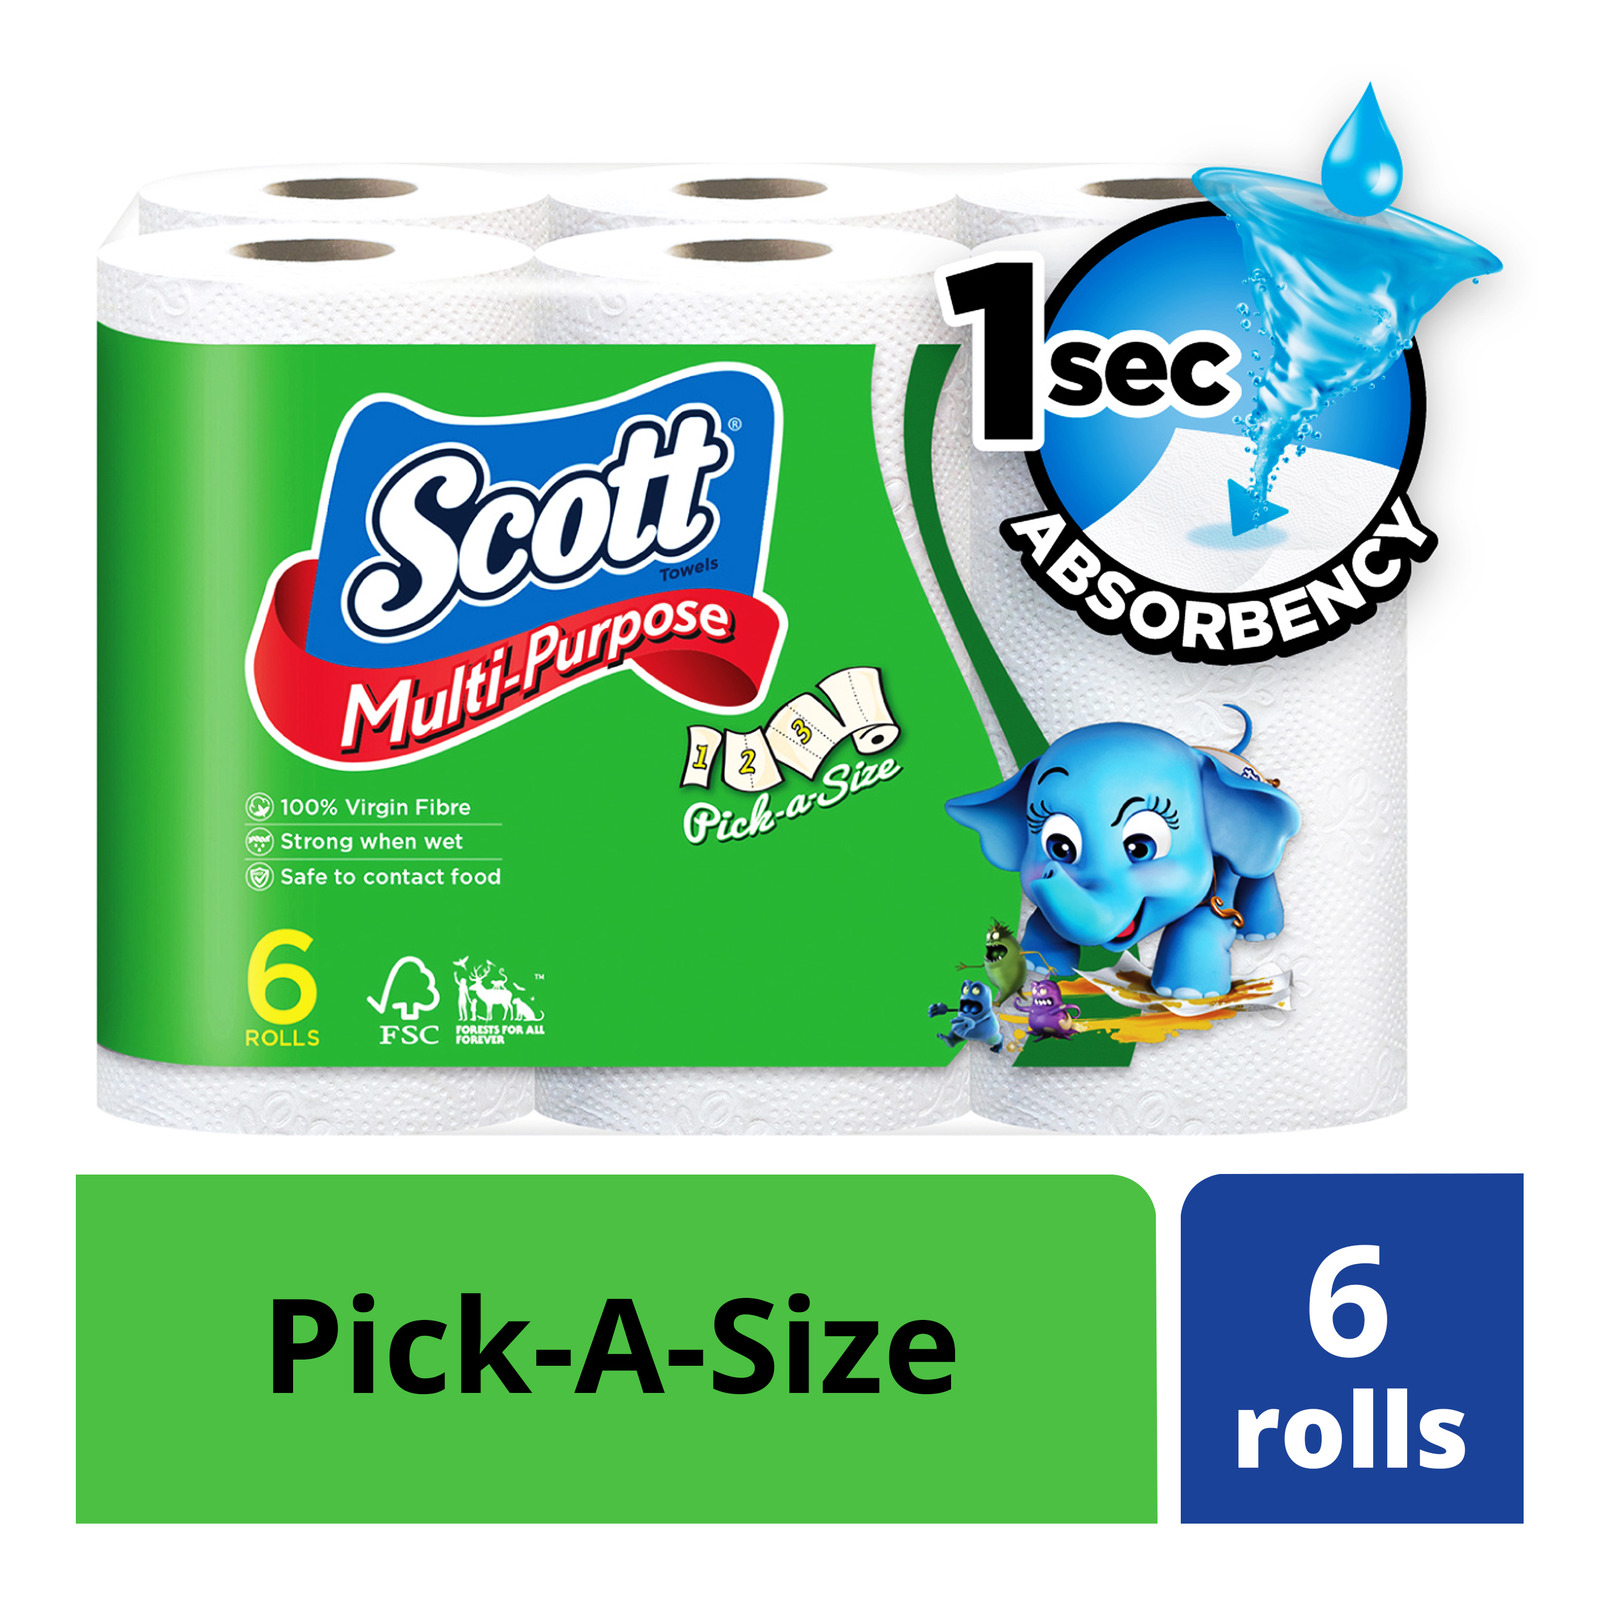 SCOTT'S Multi Purpose Pick-A-Size Kitchen Paper Towel 6s